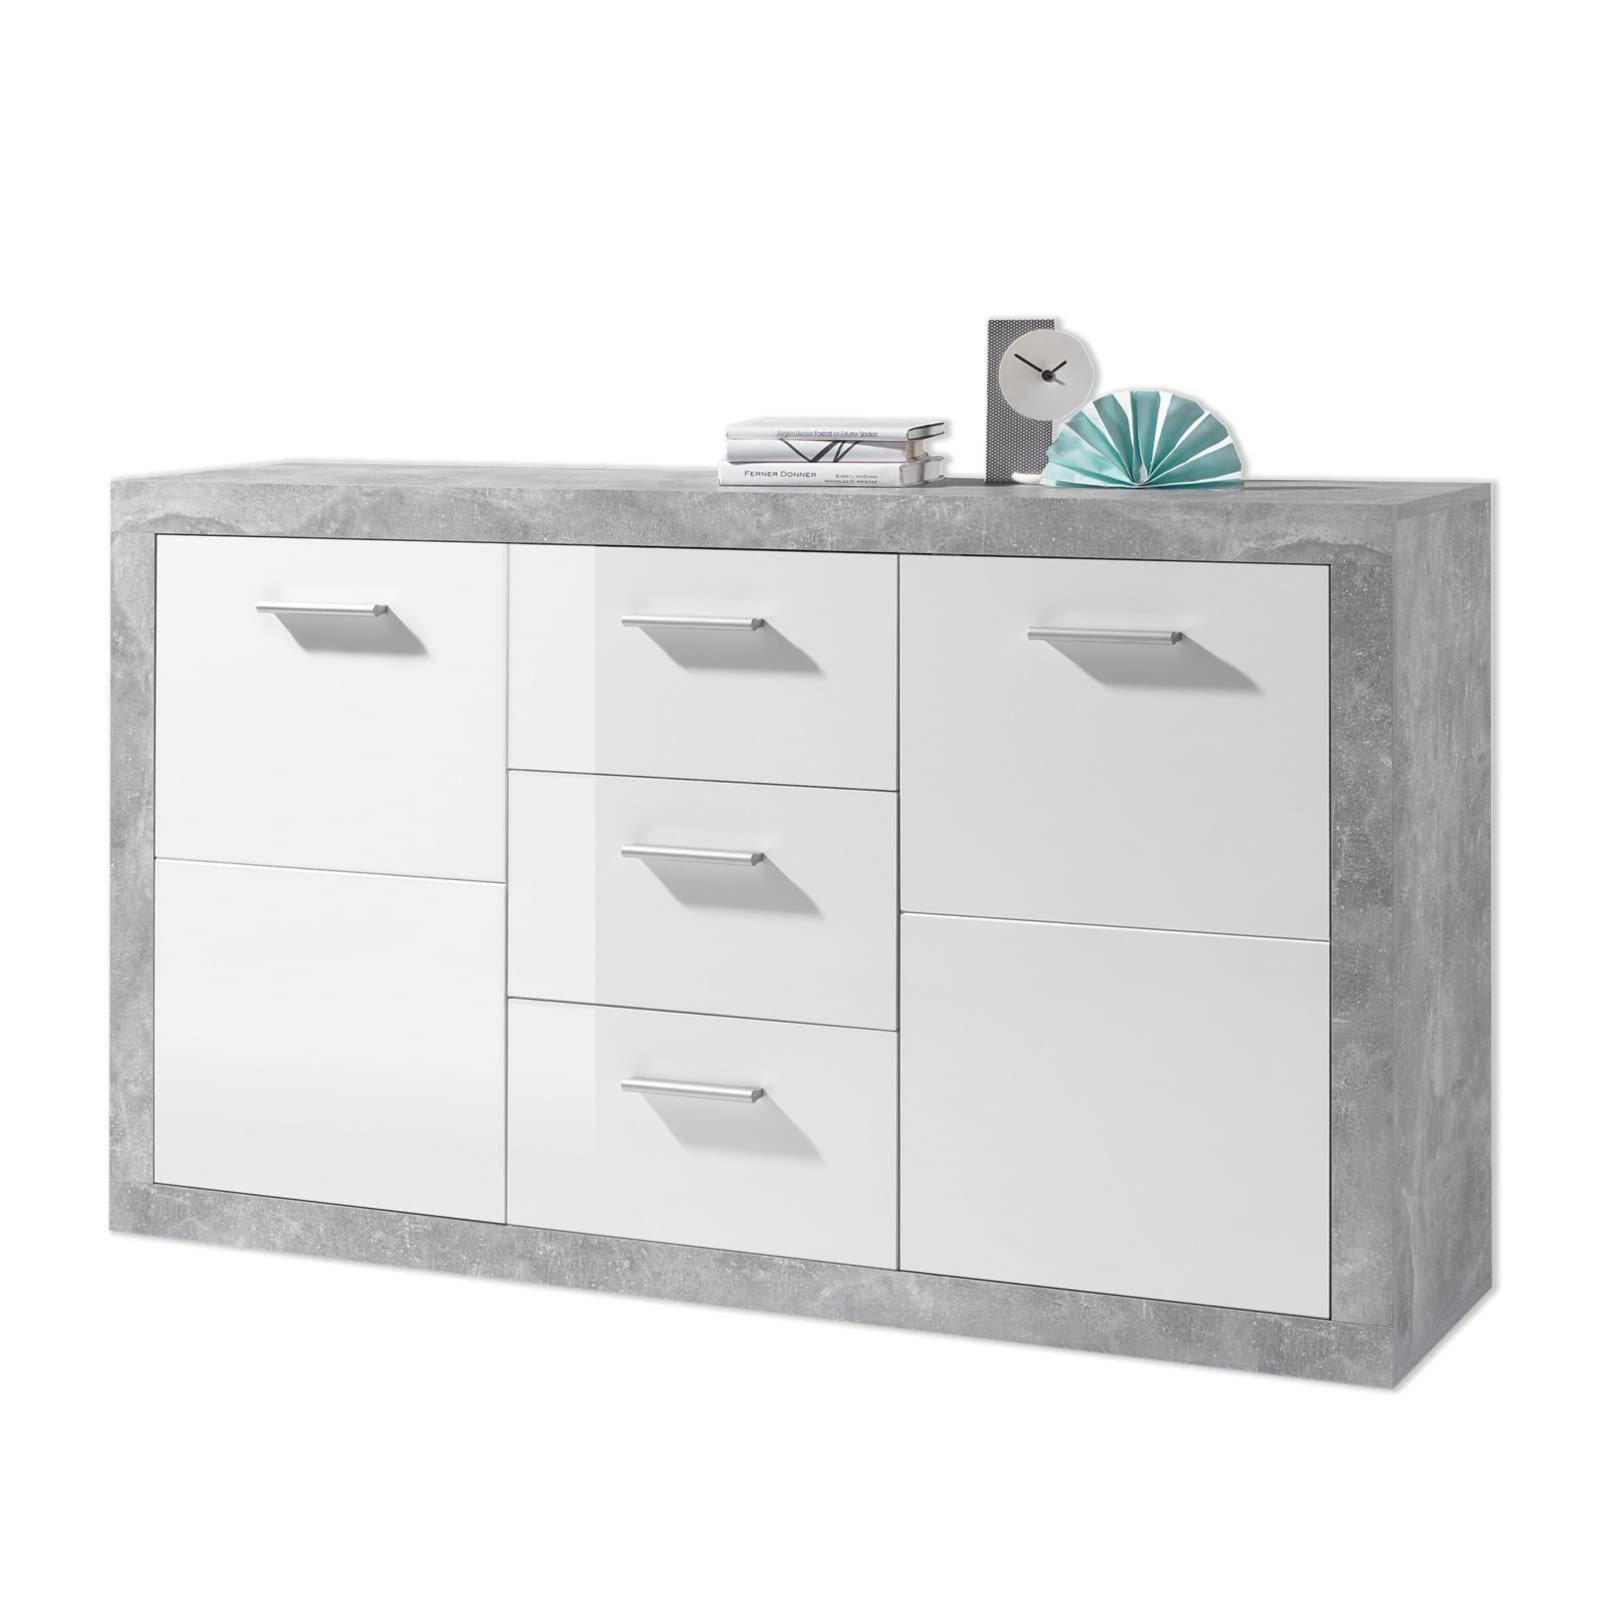 sideboard stone beton optik wei 147 cm breit. Black Bedroom Furniture Sets. Home Design Ideas